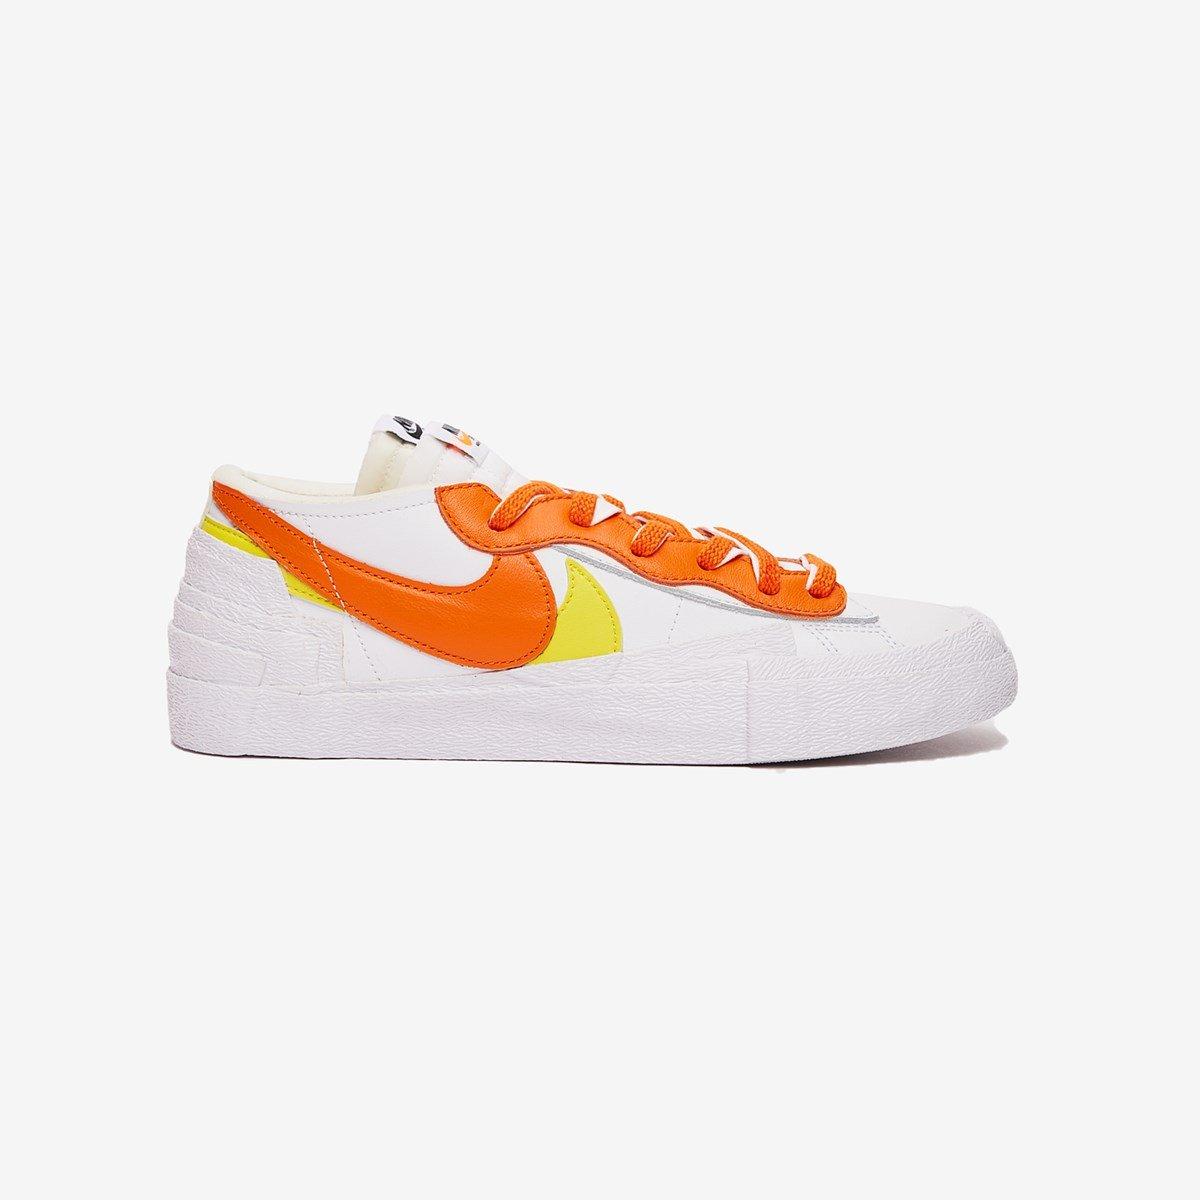 Sacai x Nike Blazer Low 'Magma Orange'}